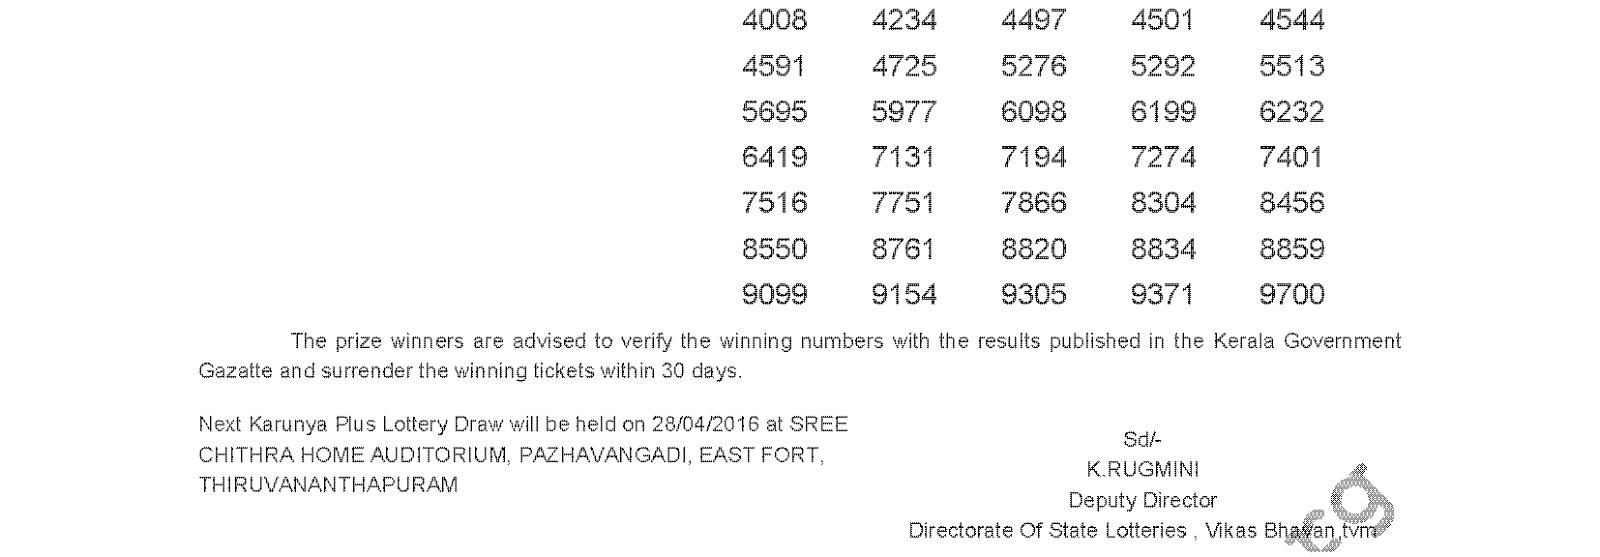 KARUNYA PLUS Lottery KN 106 Result 21-4-2016